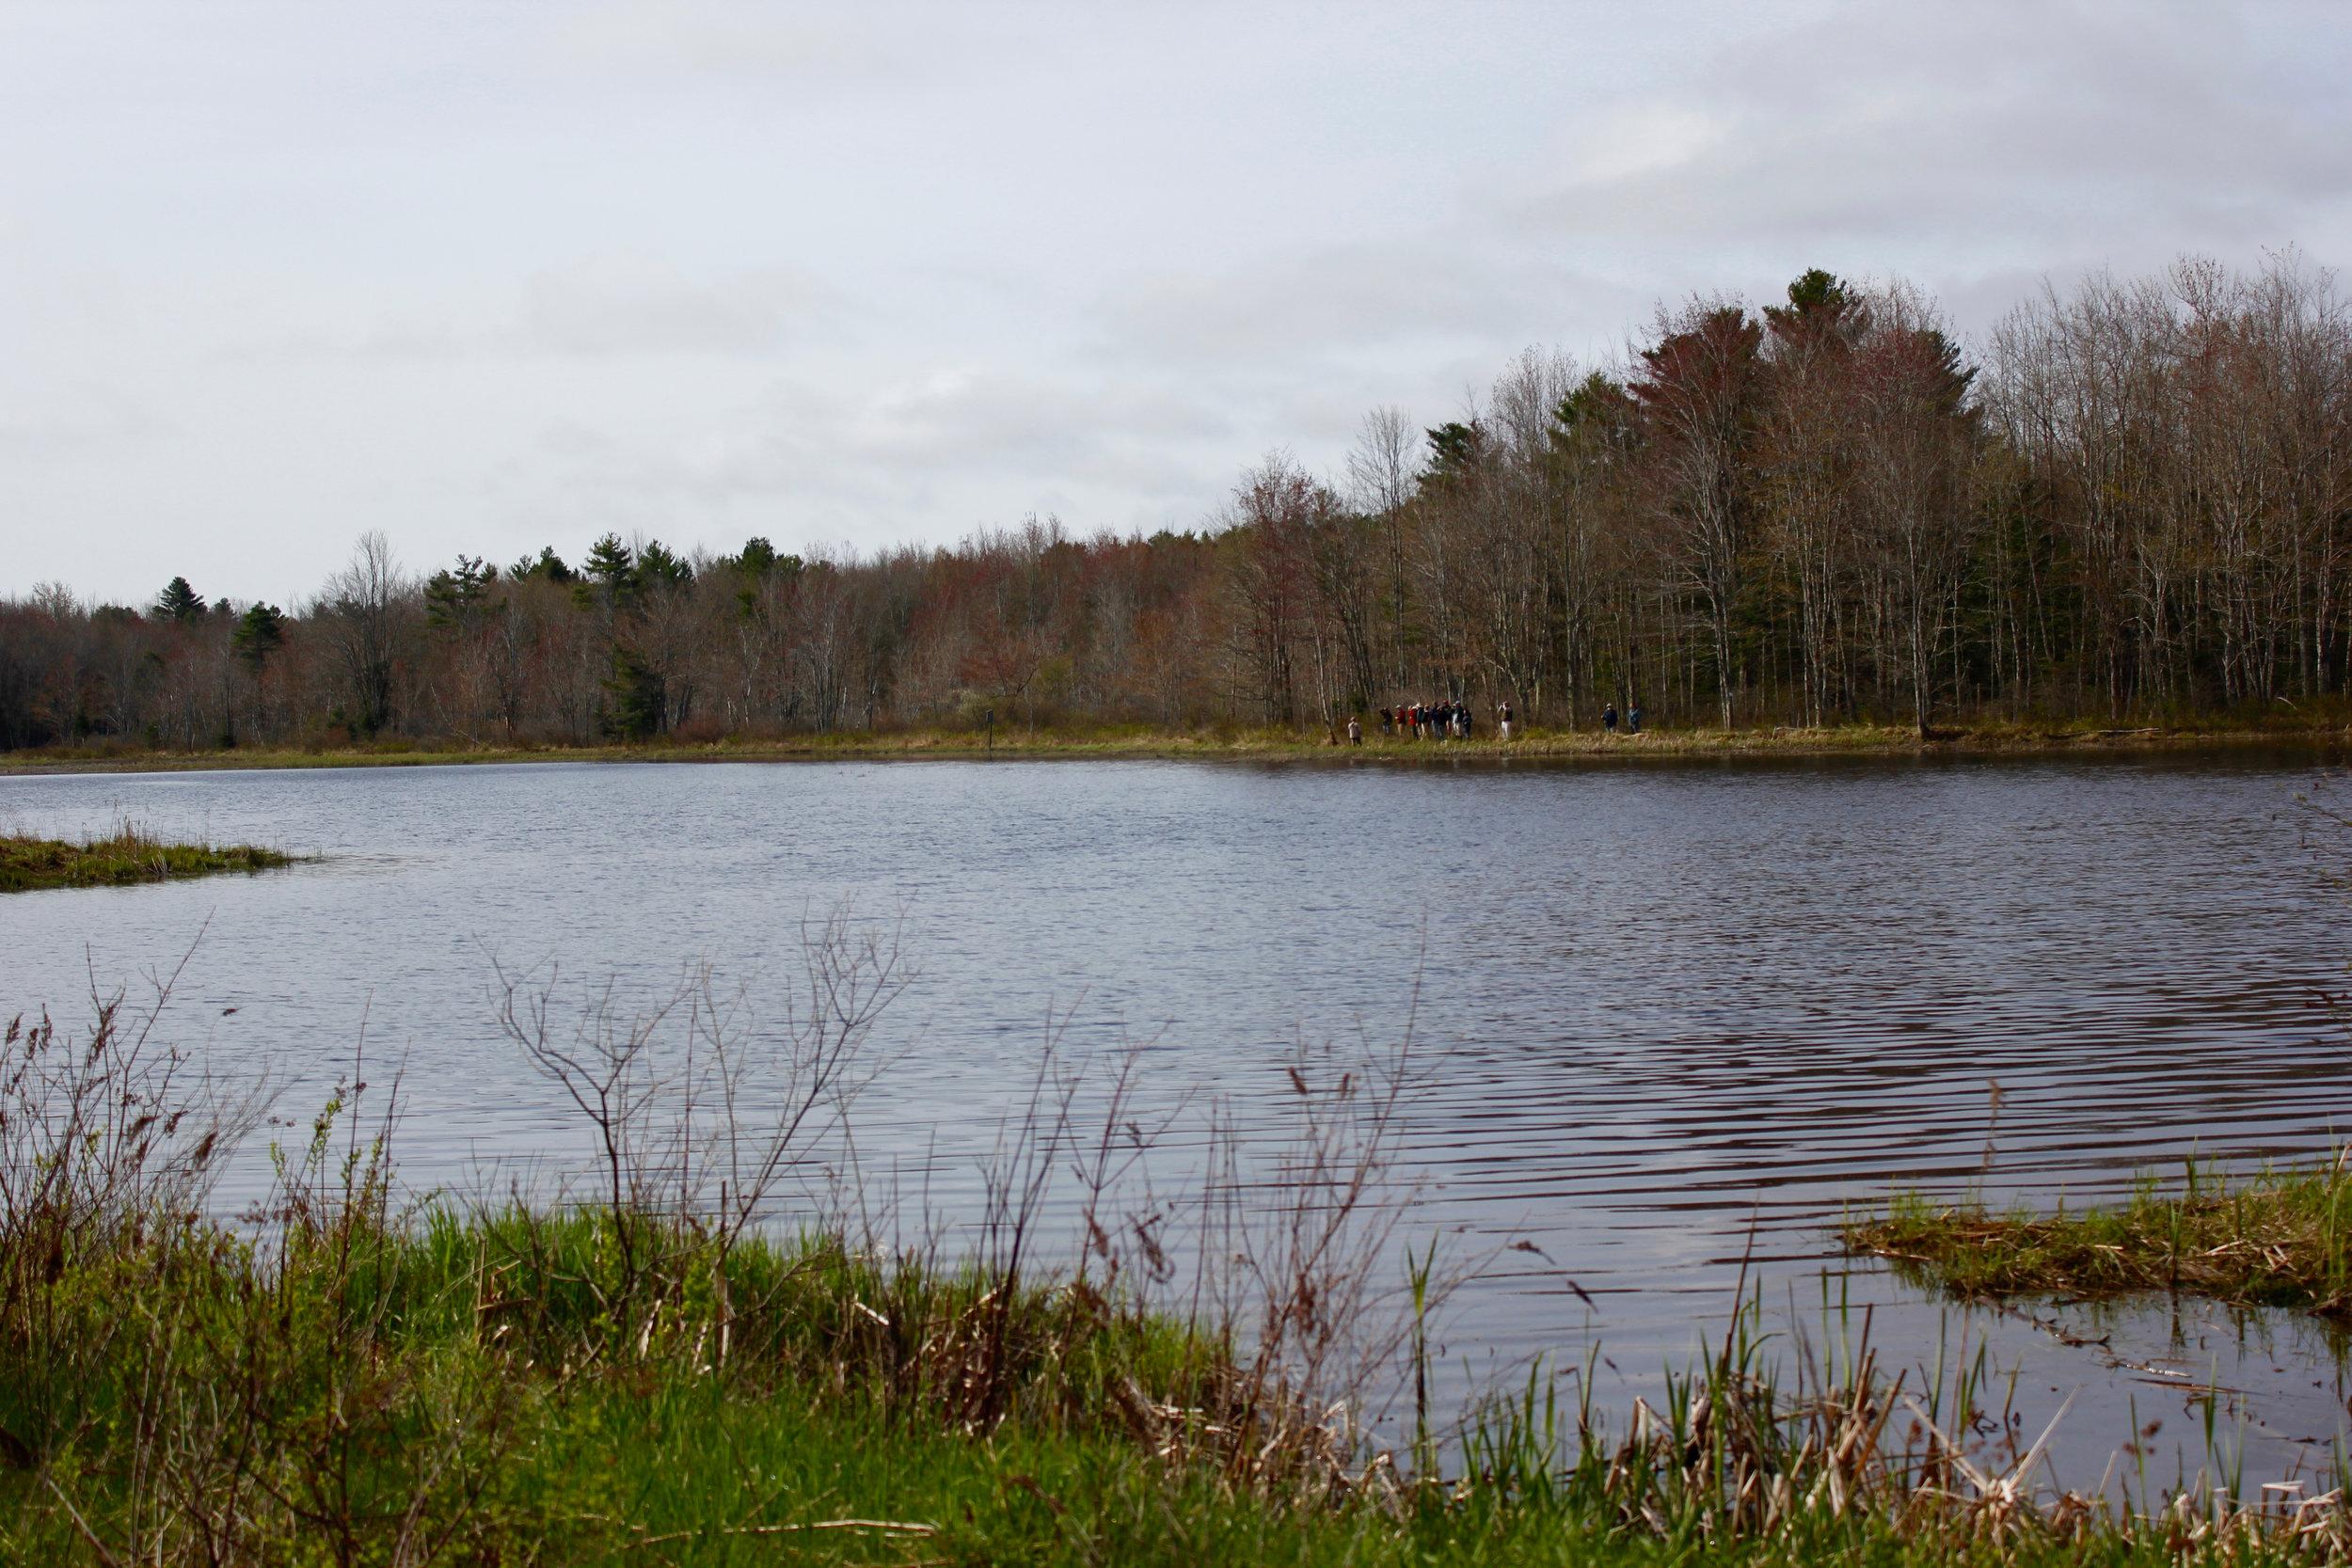 Birding group with Derek Lovitch (Freeport Wild Bird Supply) on the opposite side of the Lake